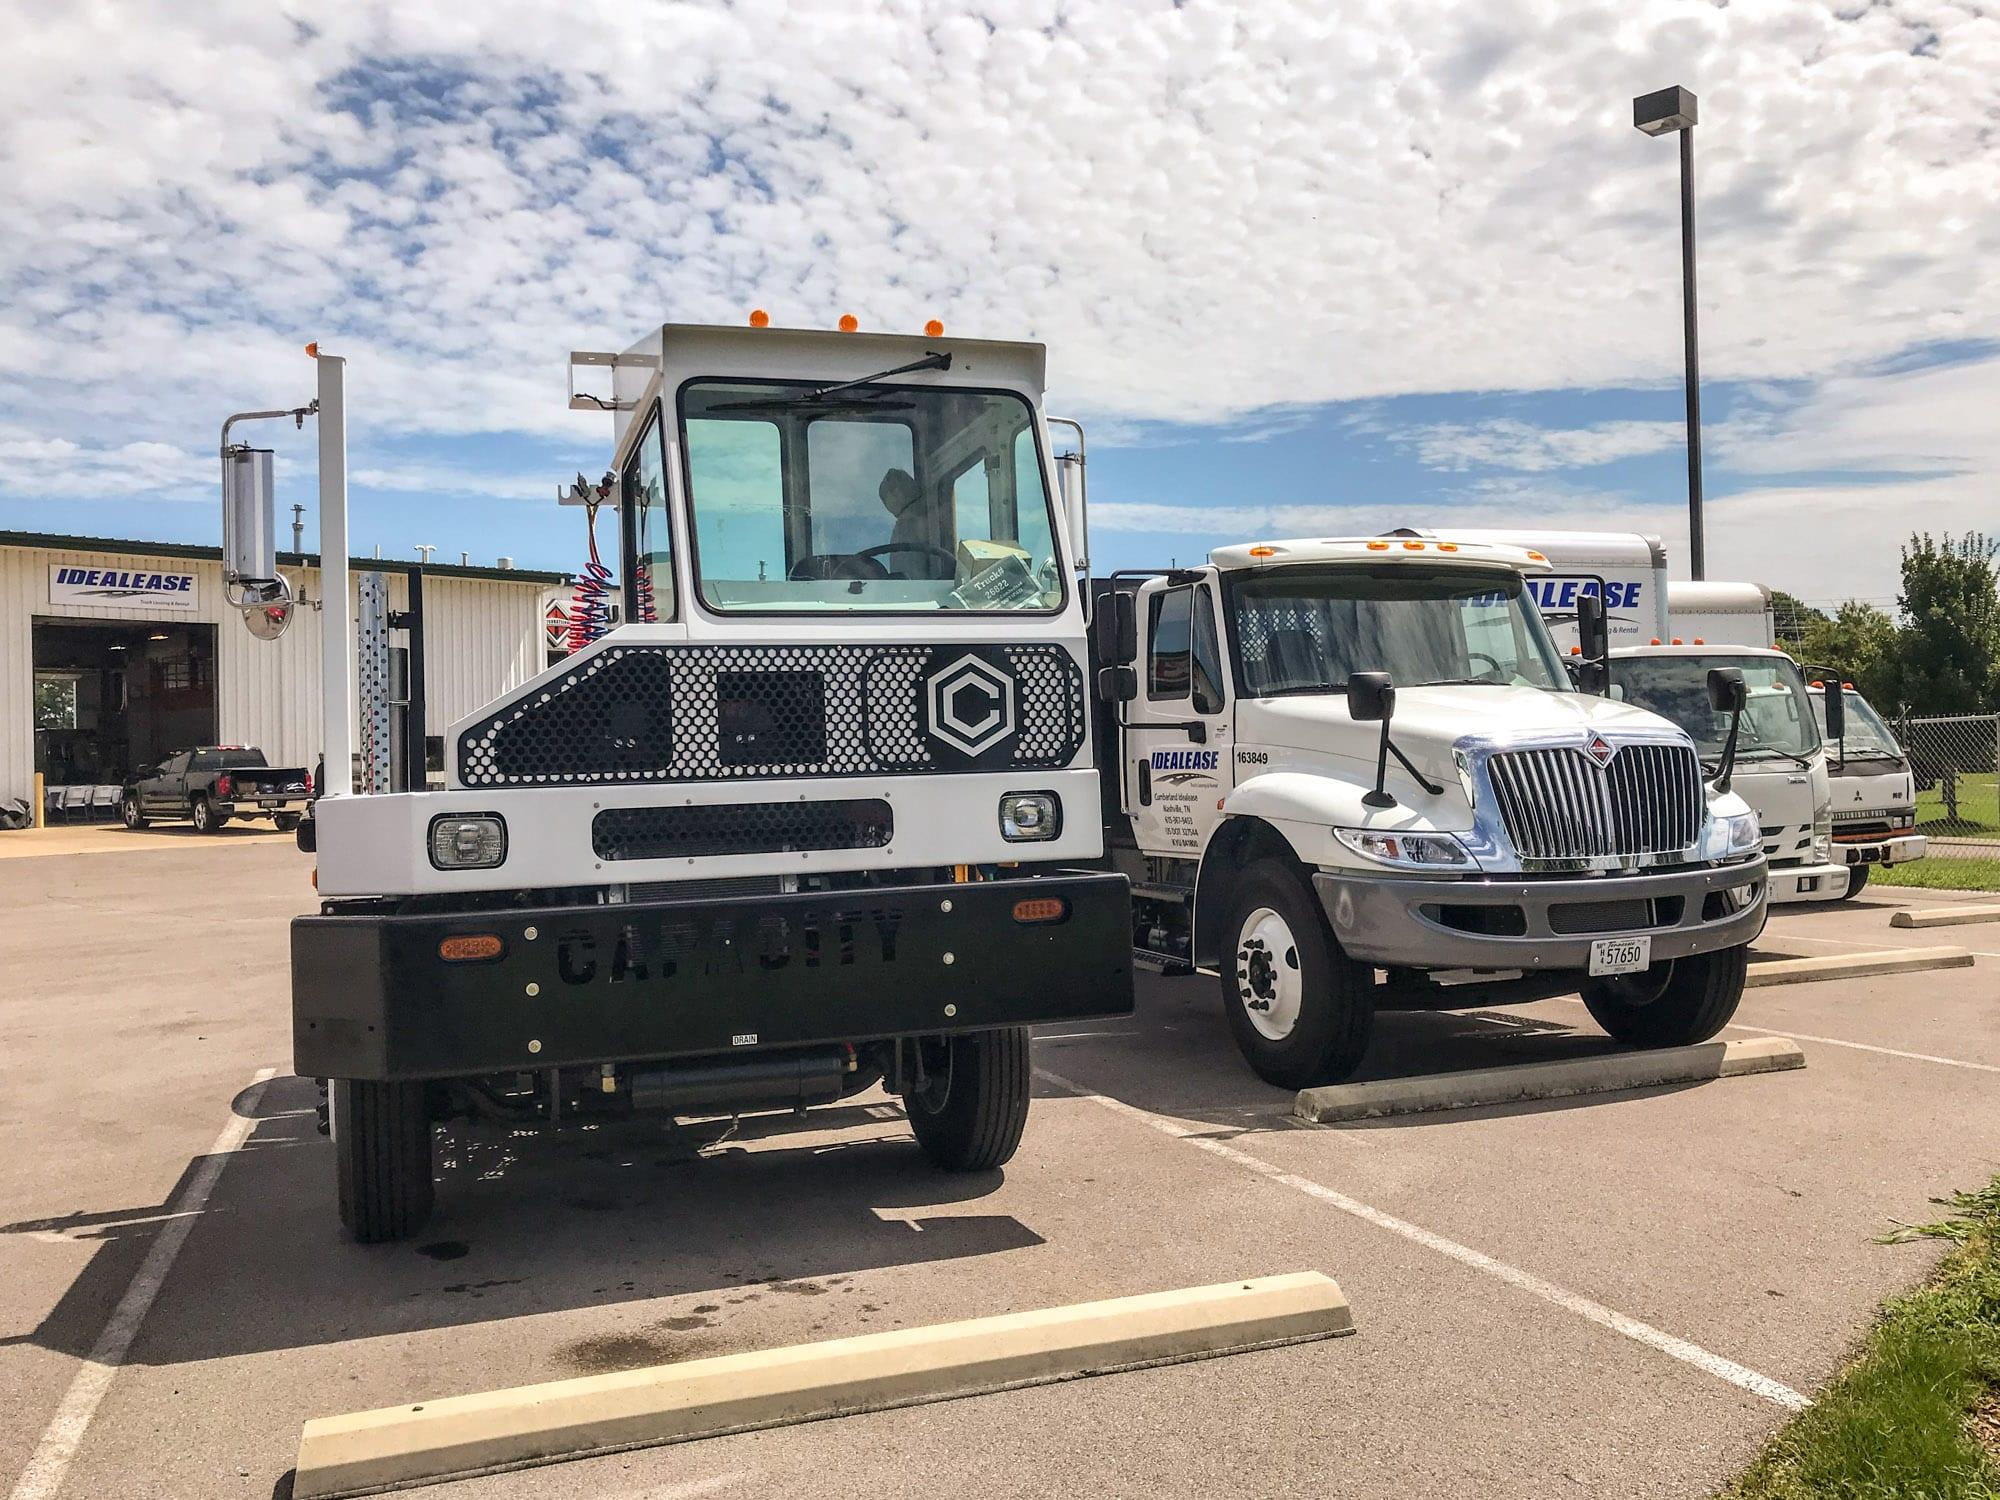 idealease-trucks-spotter-for-rent-murfreesboro-tn-1